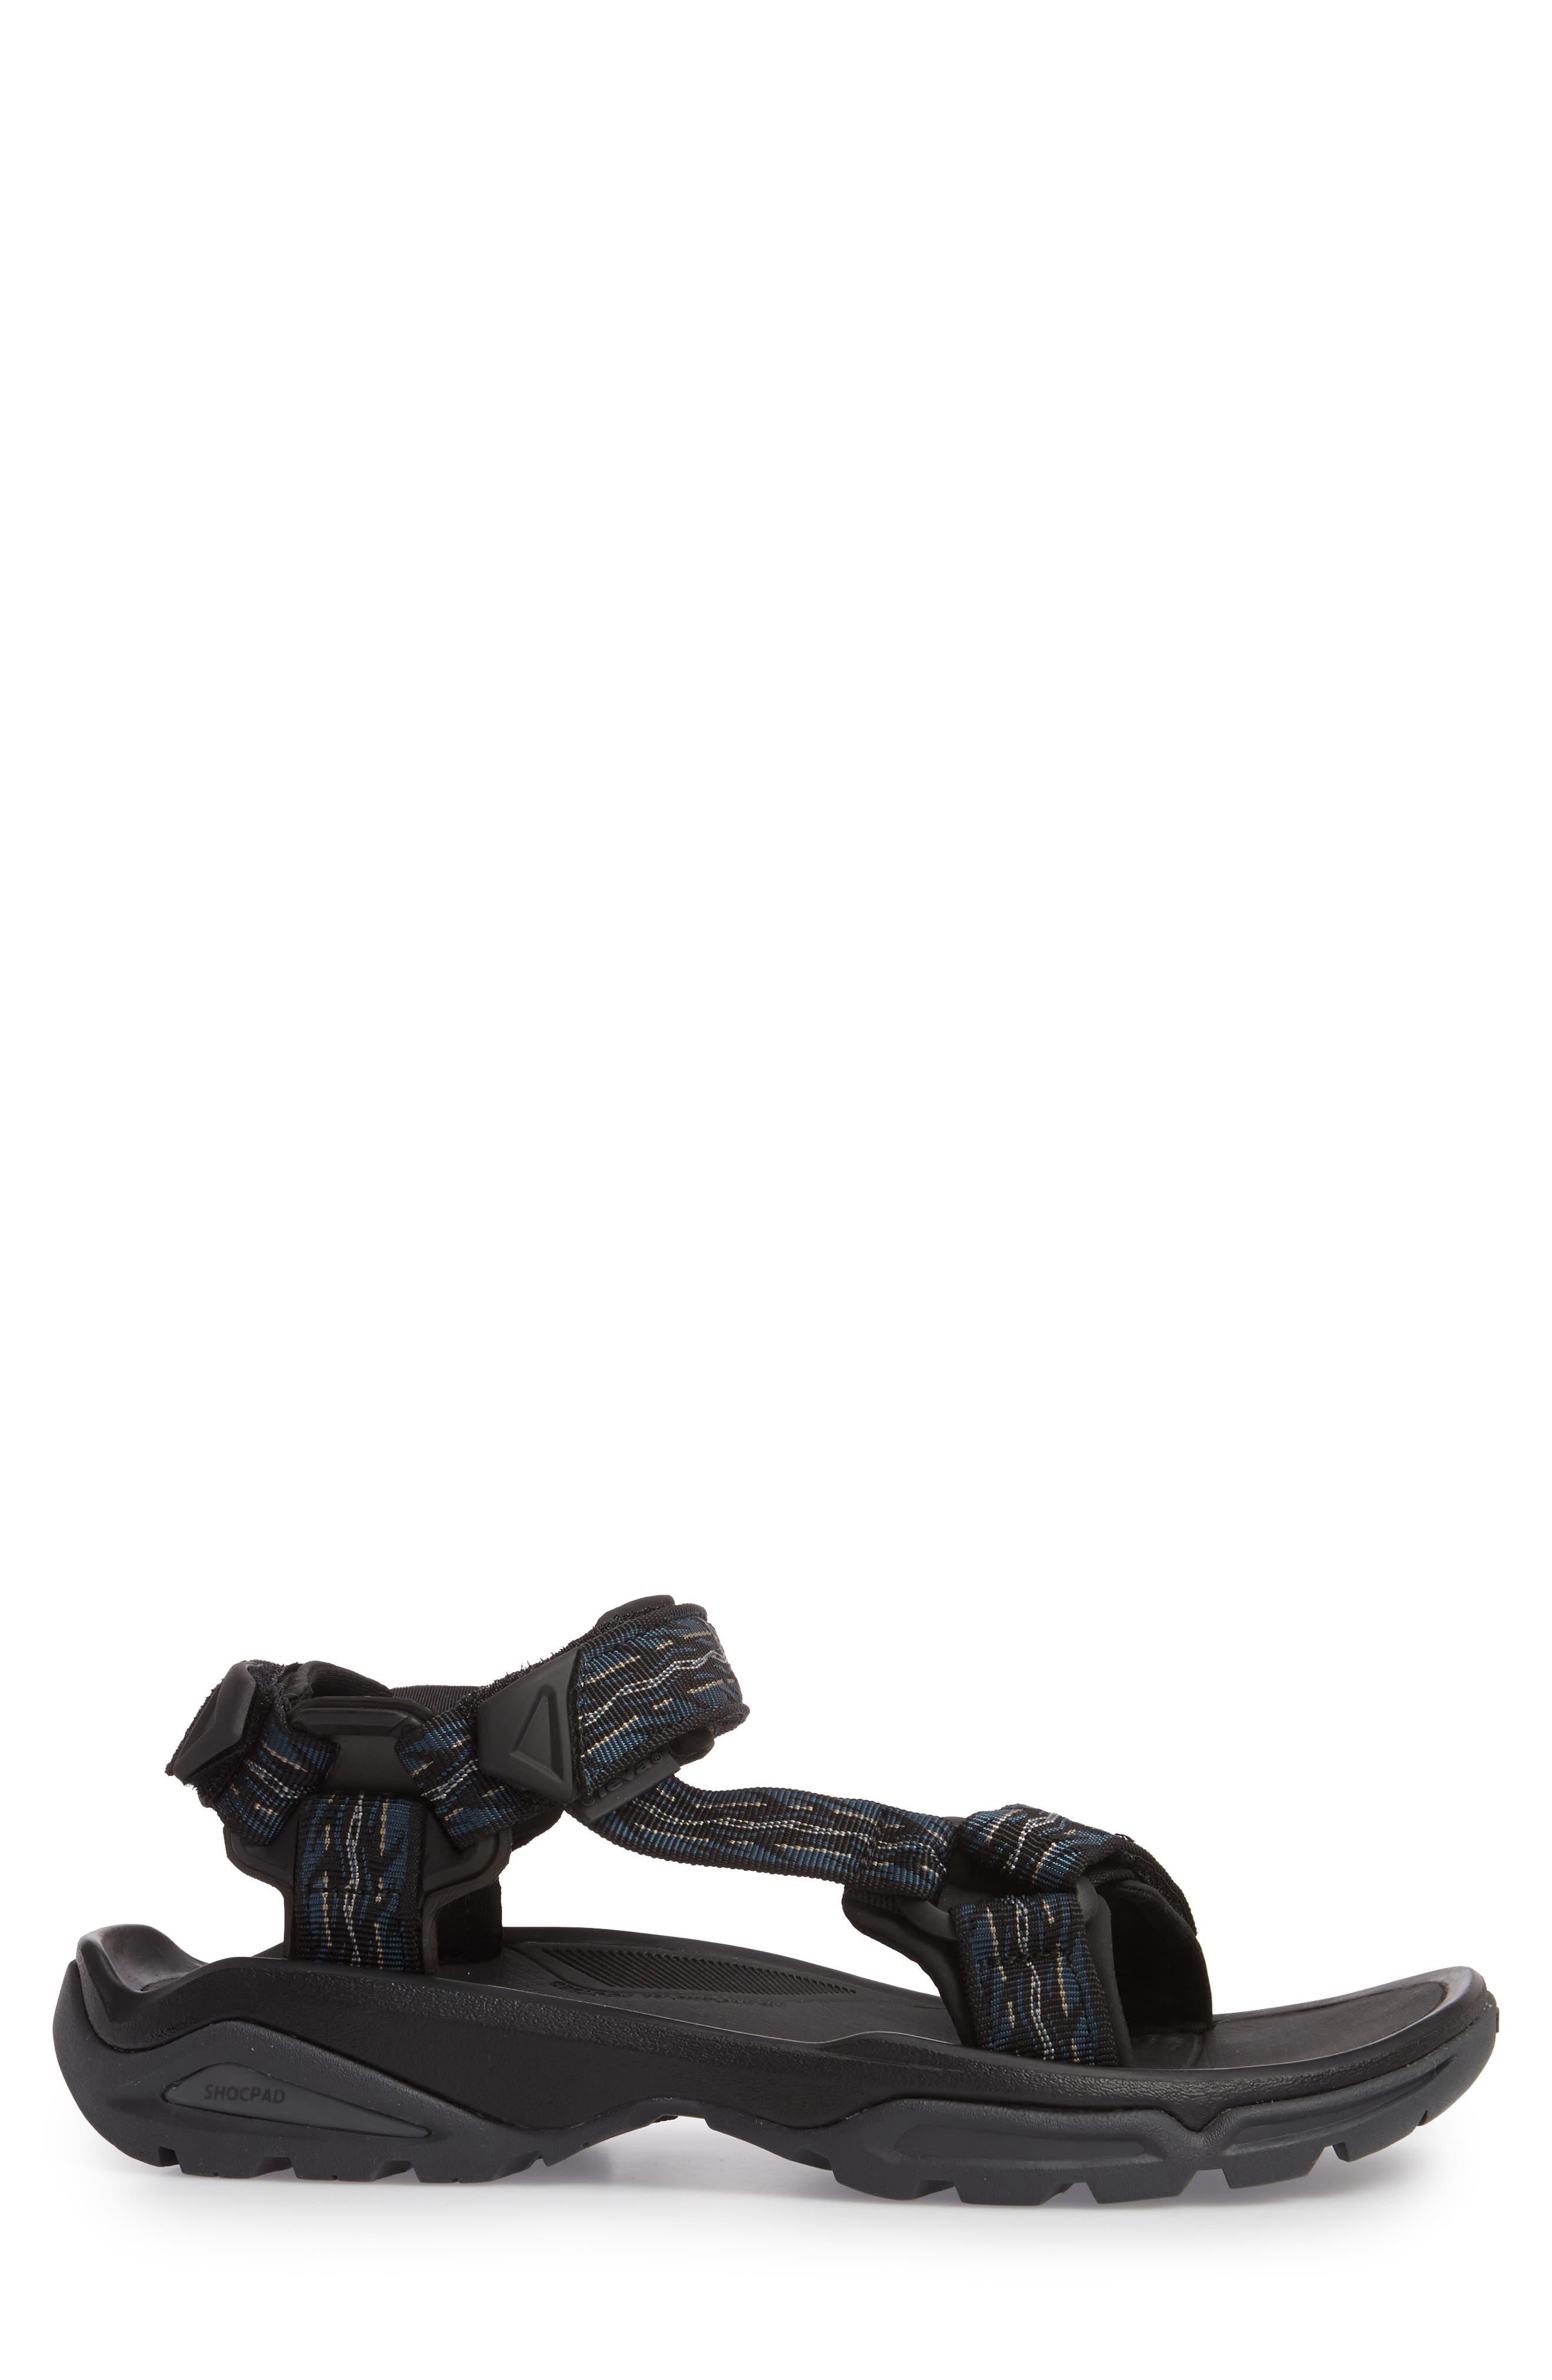 Terra Fi 4 Sport Sandal,                             Alternate thumbnail 3, color,                             Midnight Blue Nylon